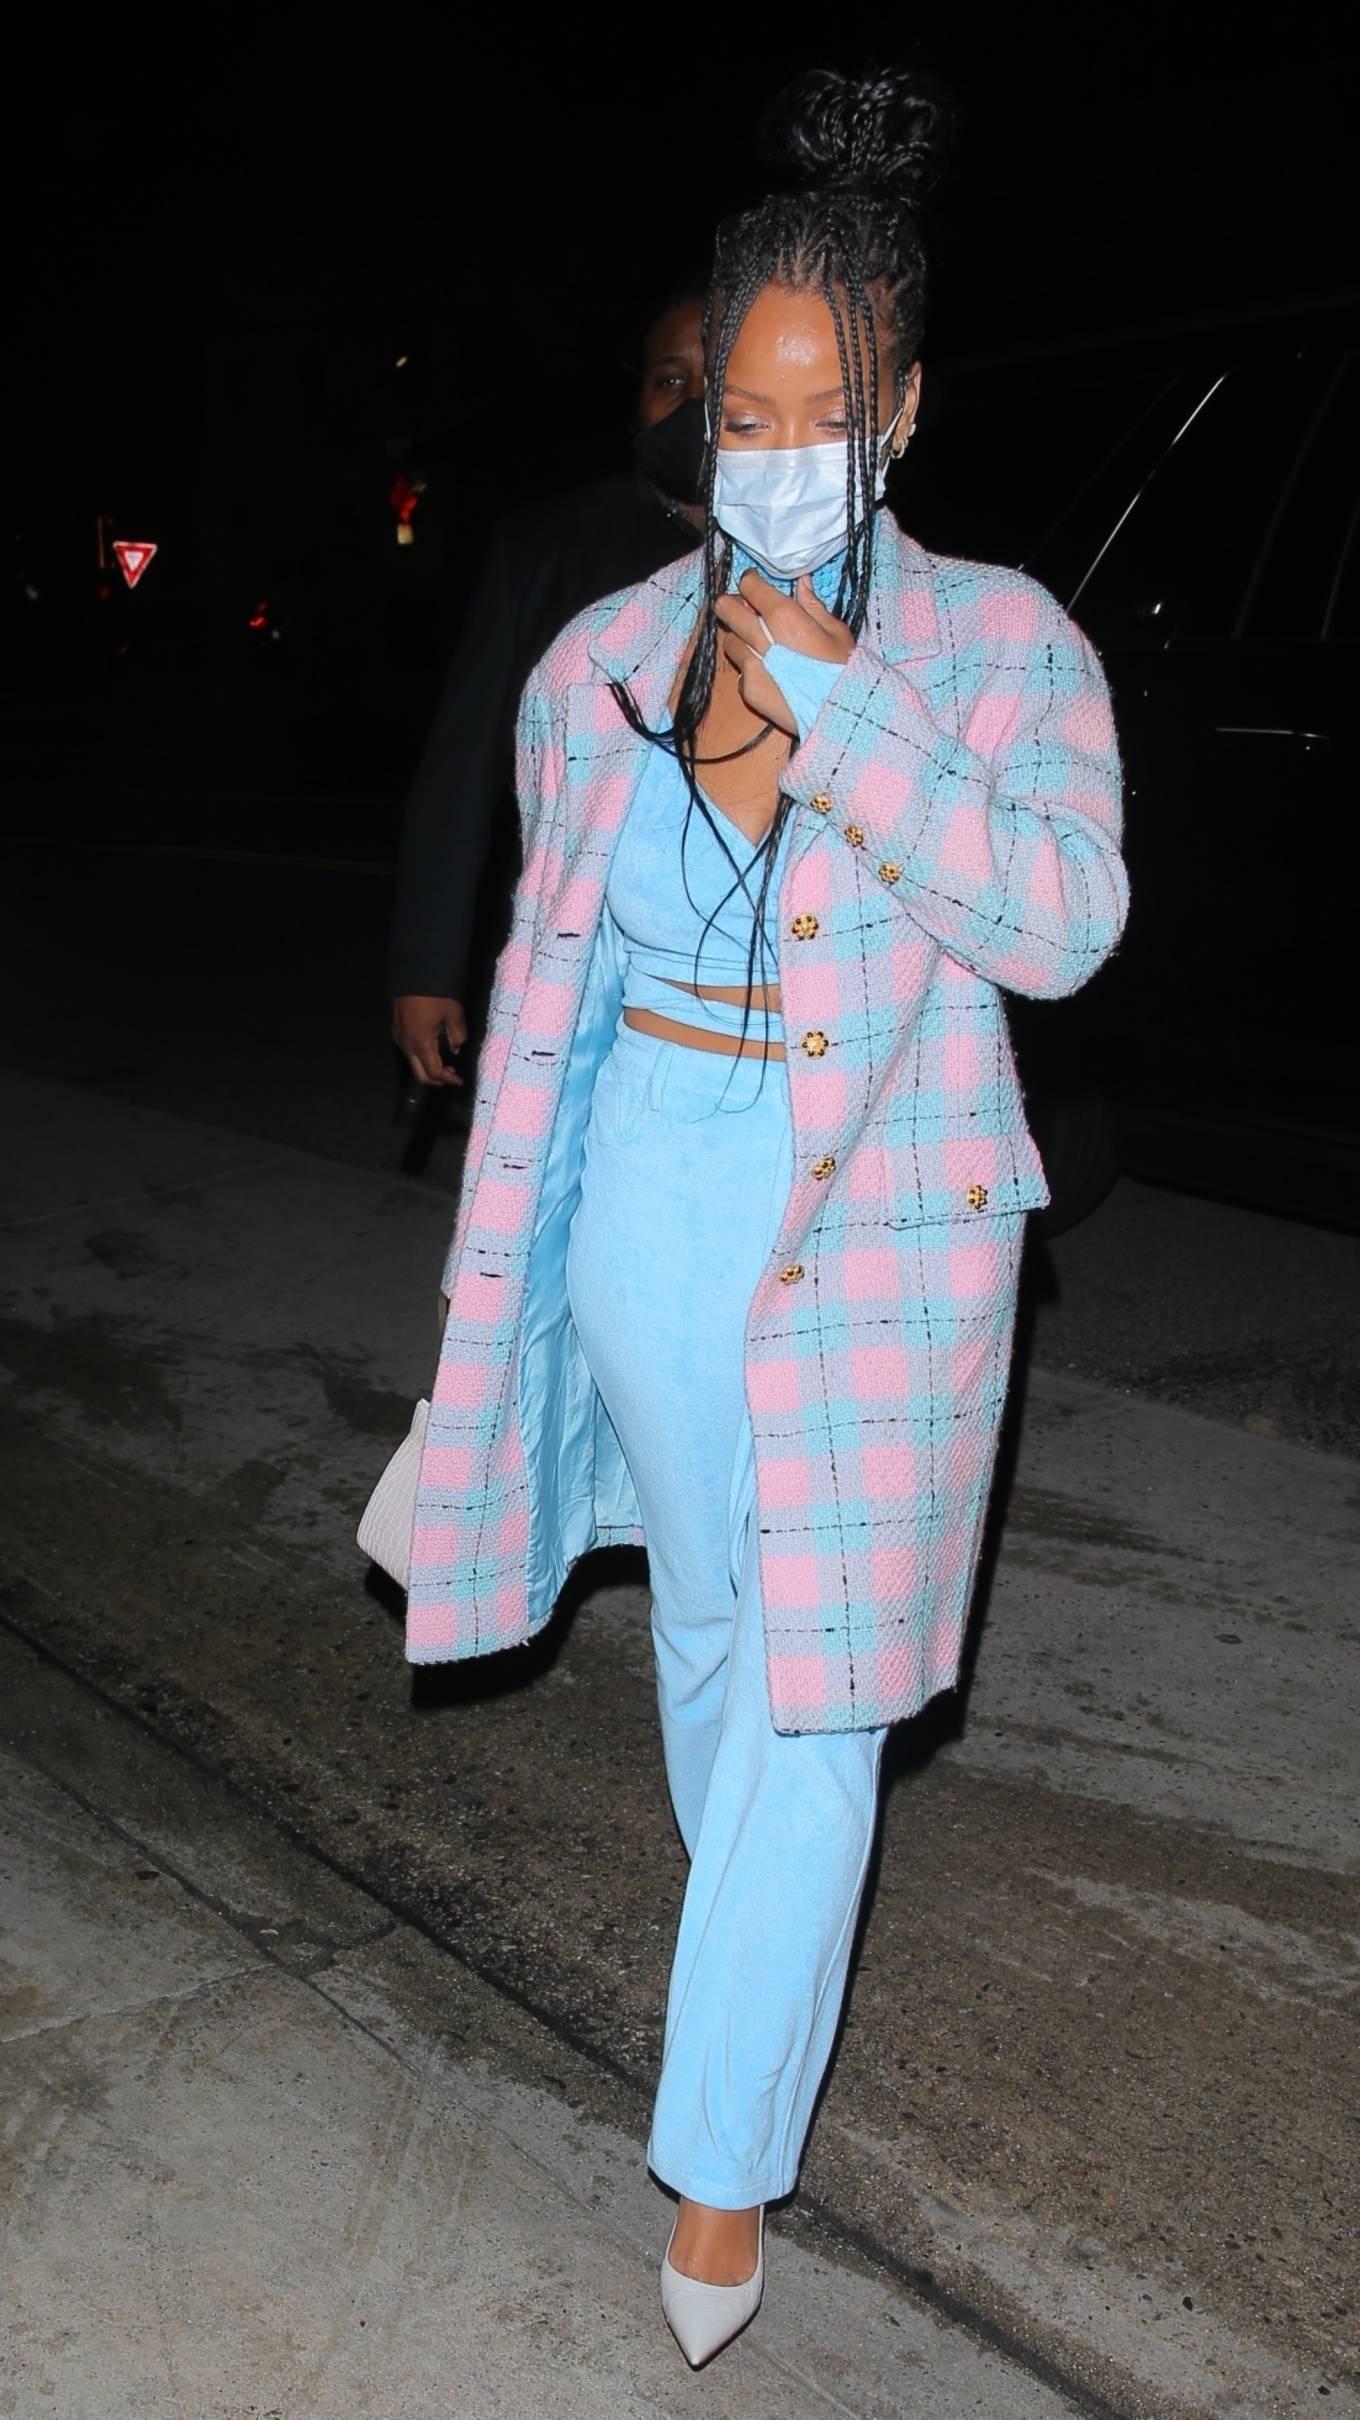 Rihanna - Dinner candids in Santa Monica at Giorgio Baldi